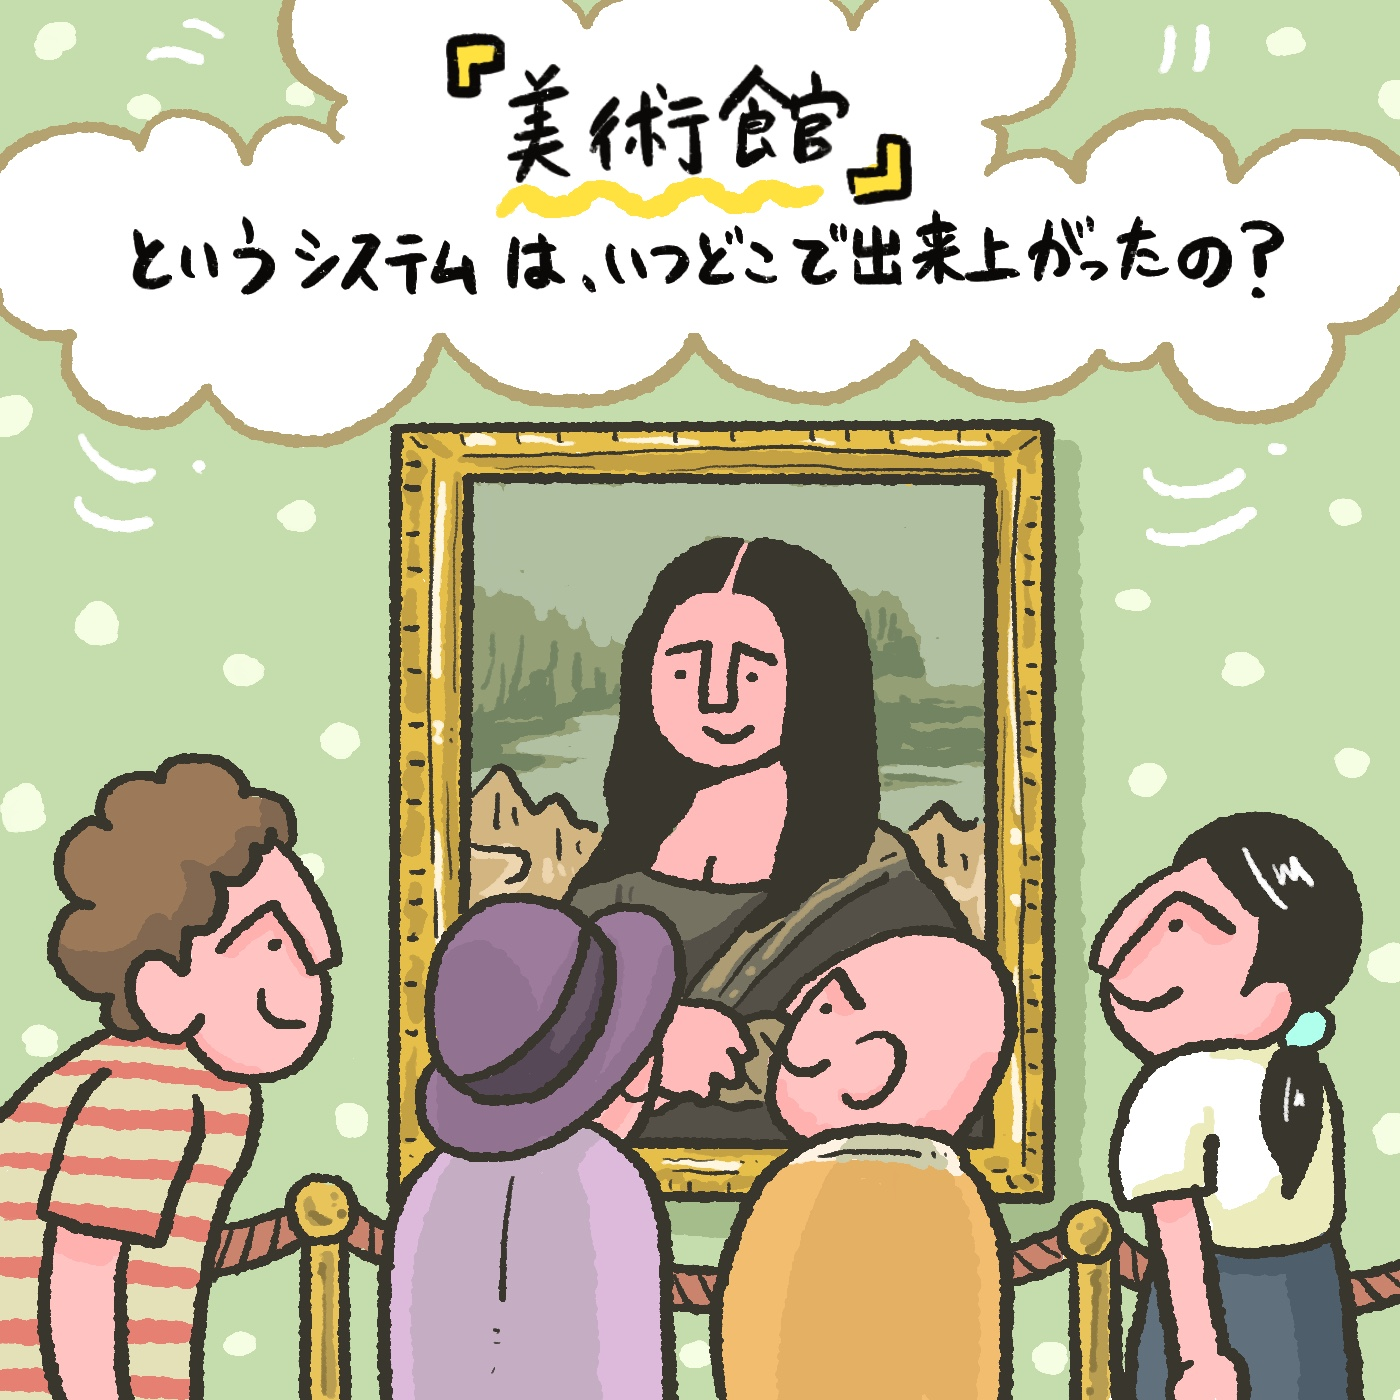 OBIKAKE ナニソレ 美術館 藤野遼太